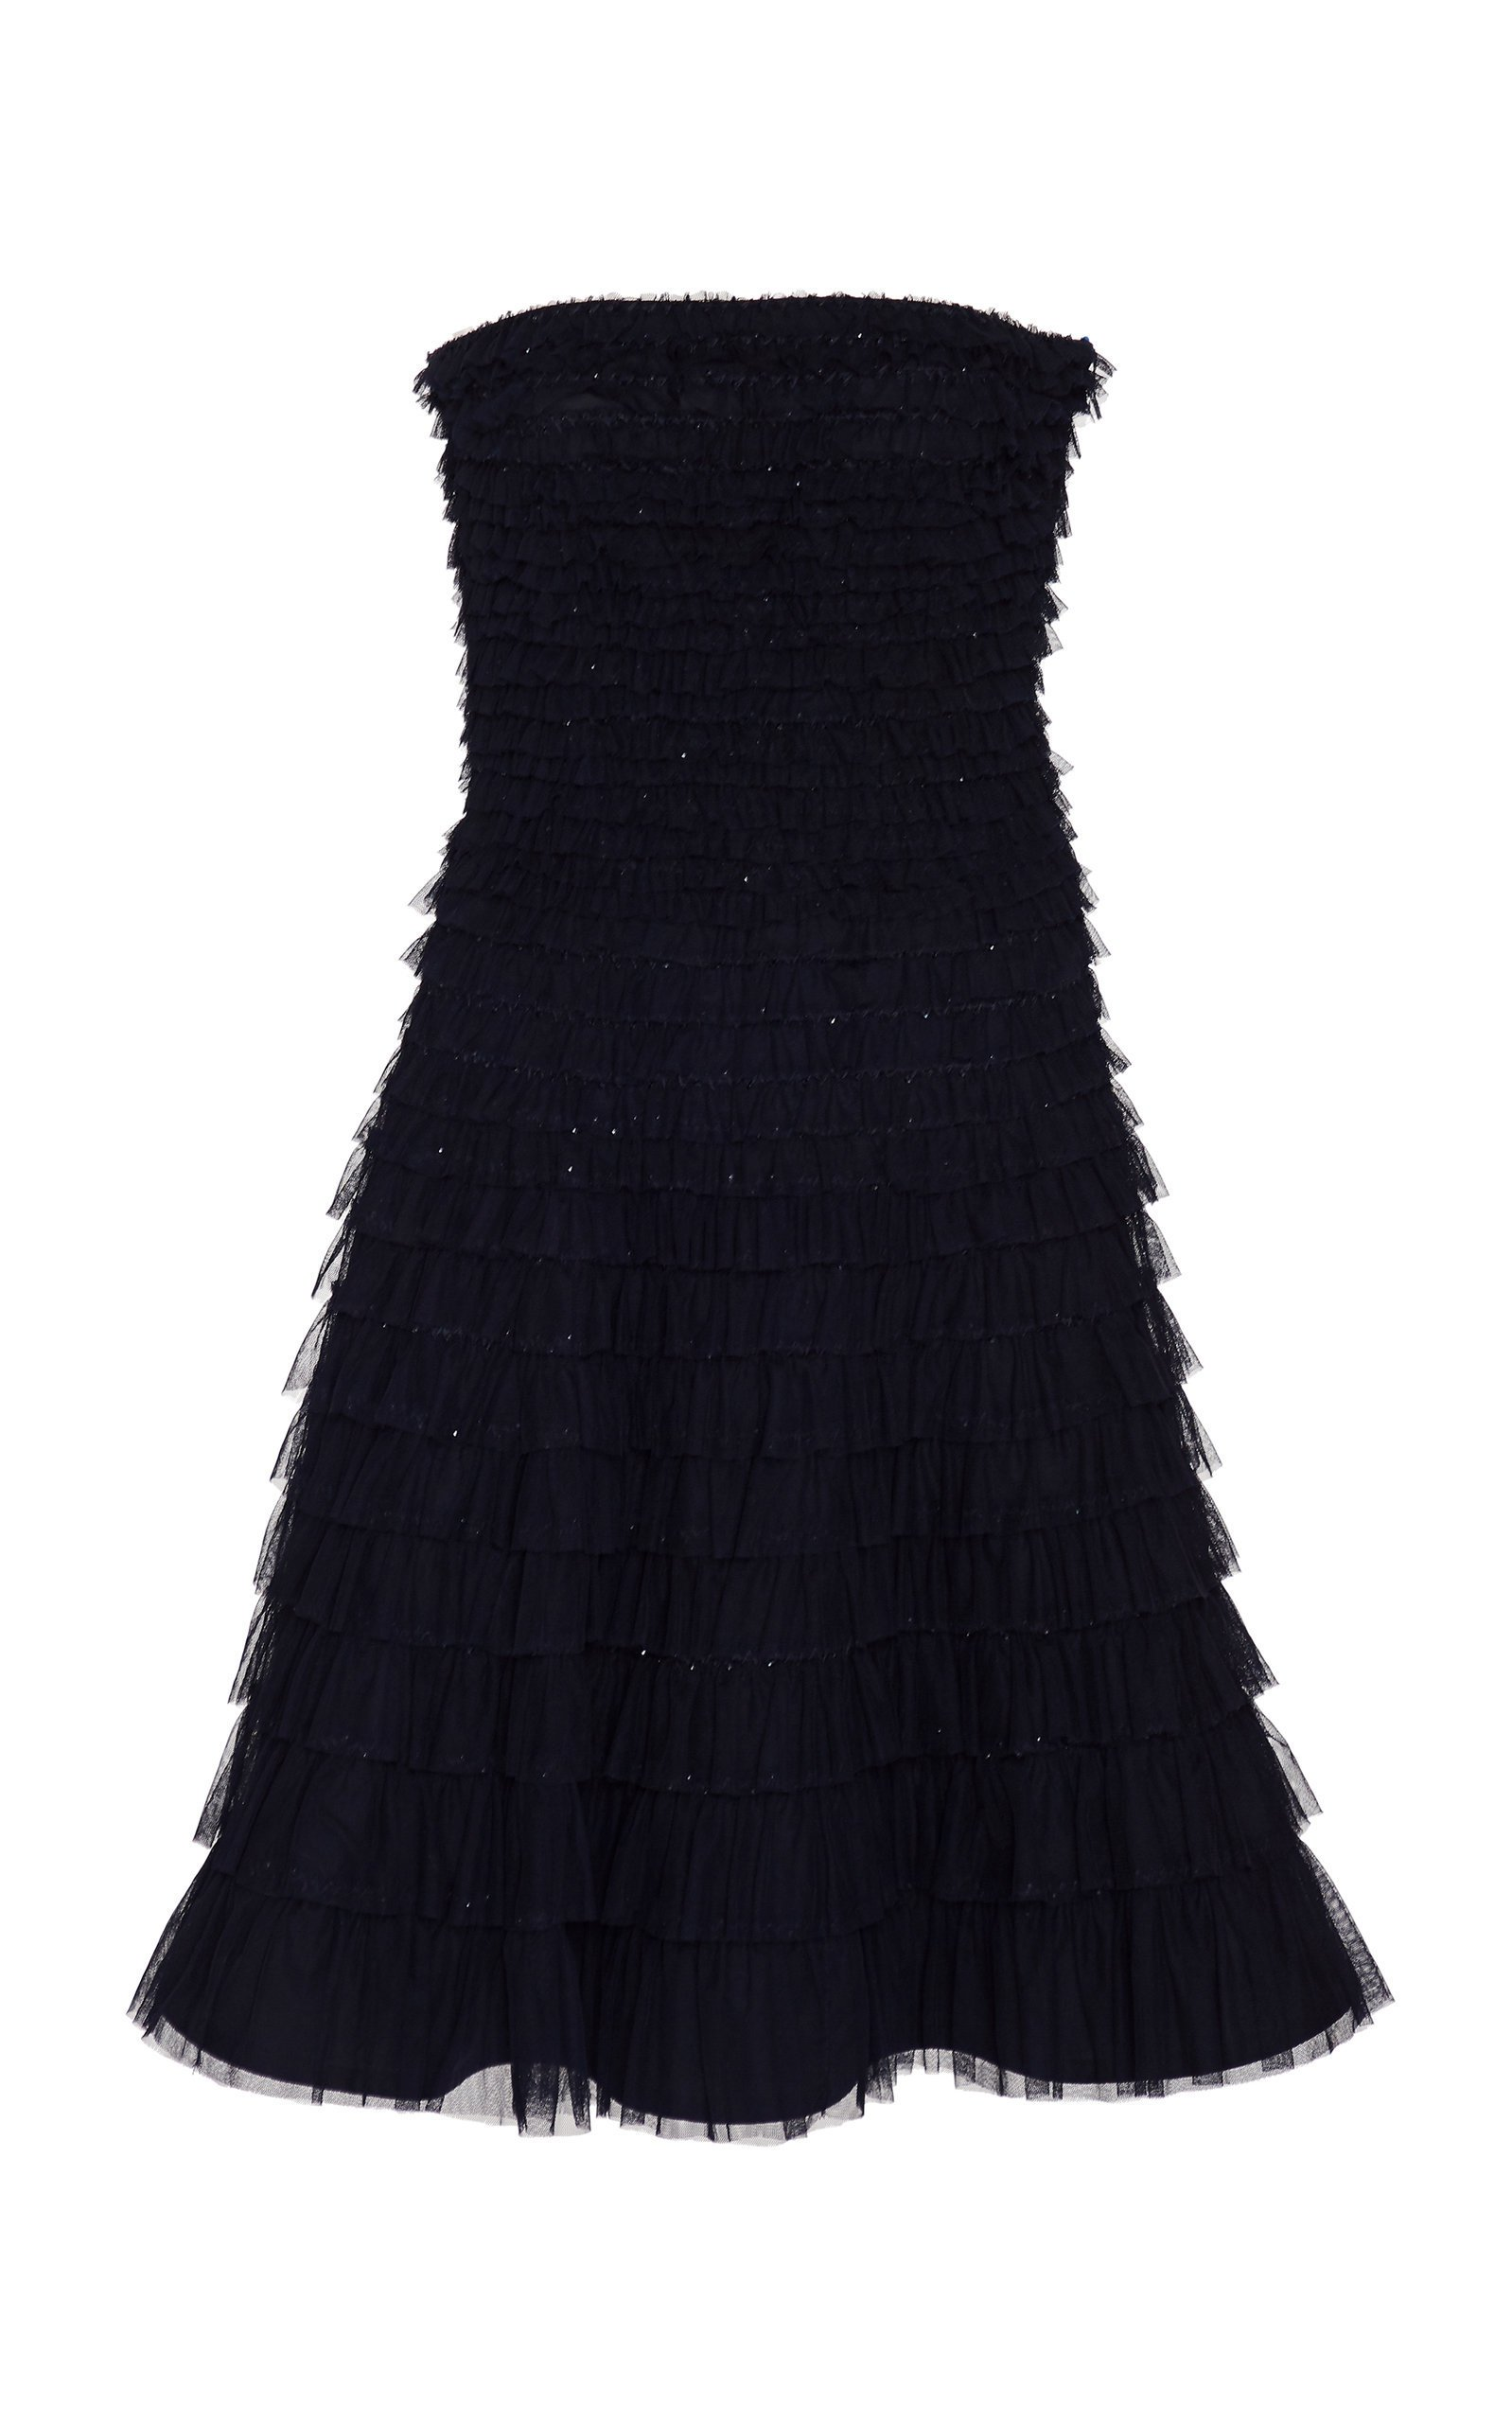 Ralph Lauren Jordynn Tiered Tulle Strapless Dress